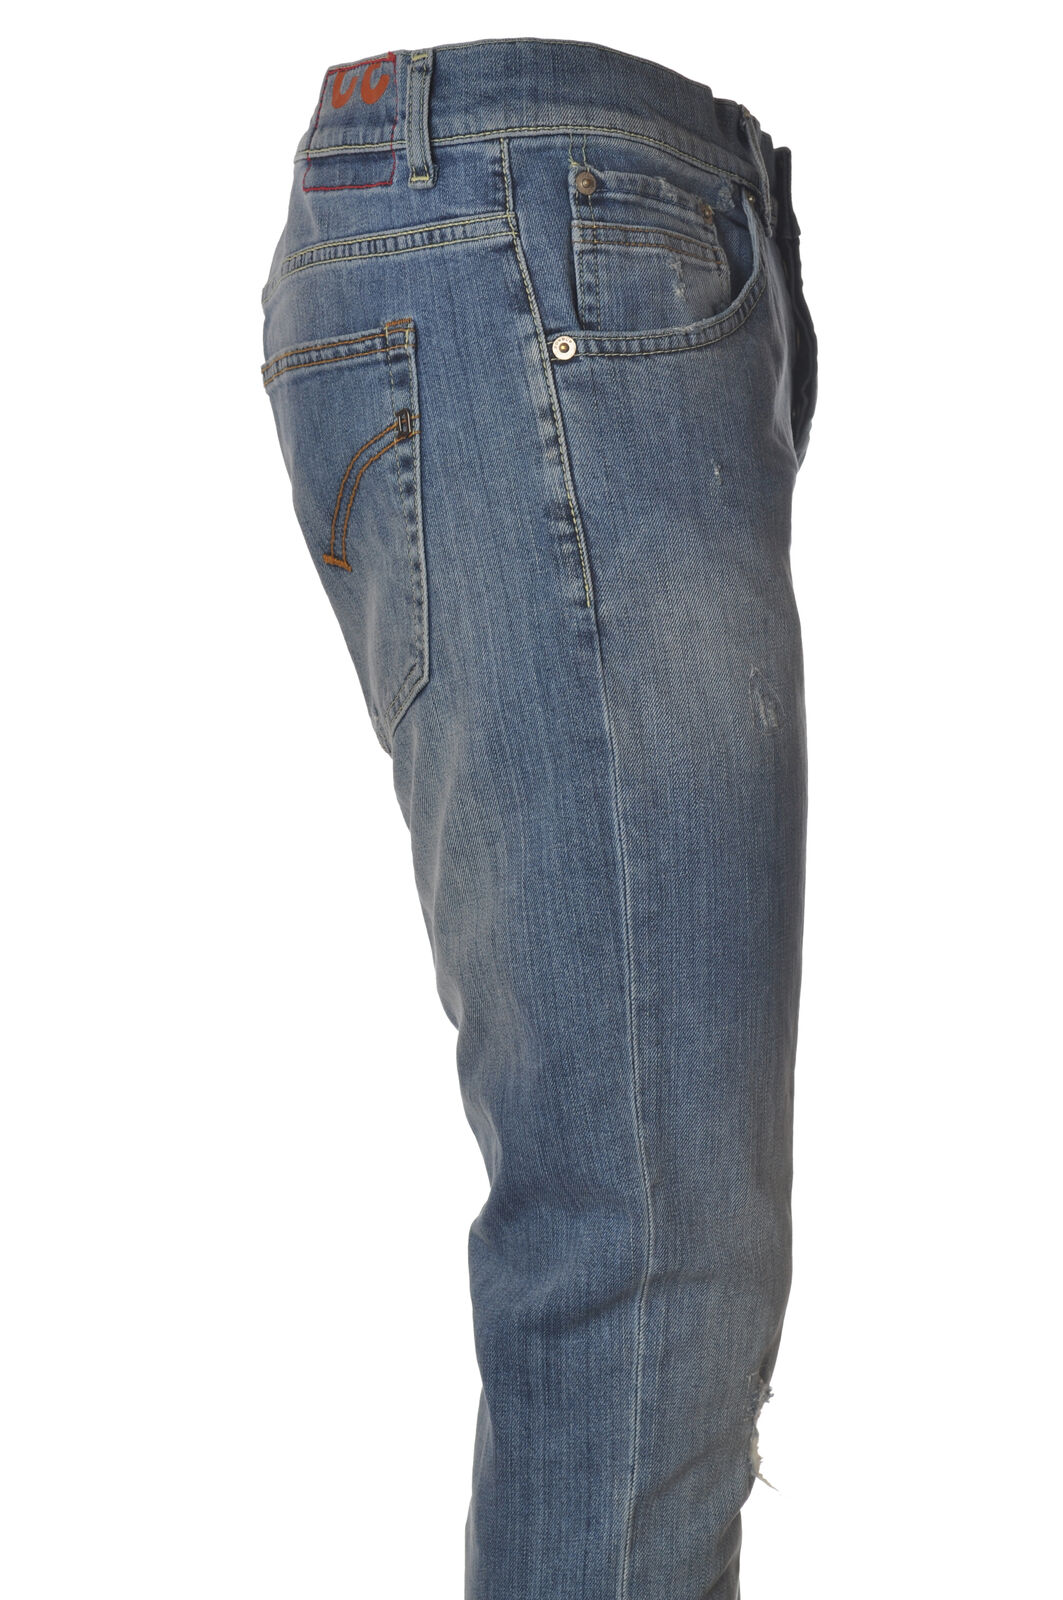 Dondup - Jeans-Pants-slim fit - Man - Denim - 5927406E191211